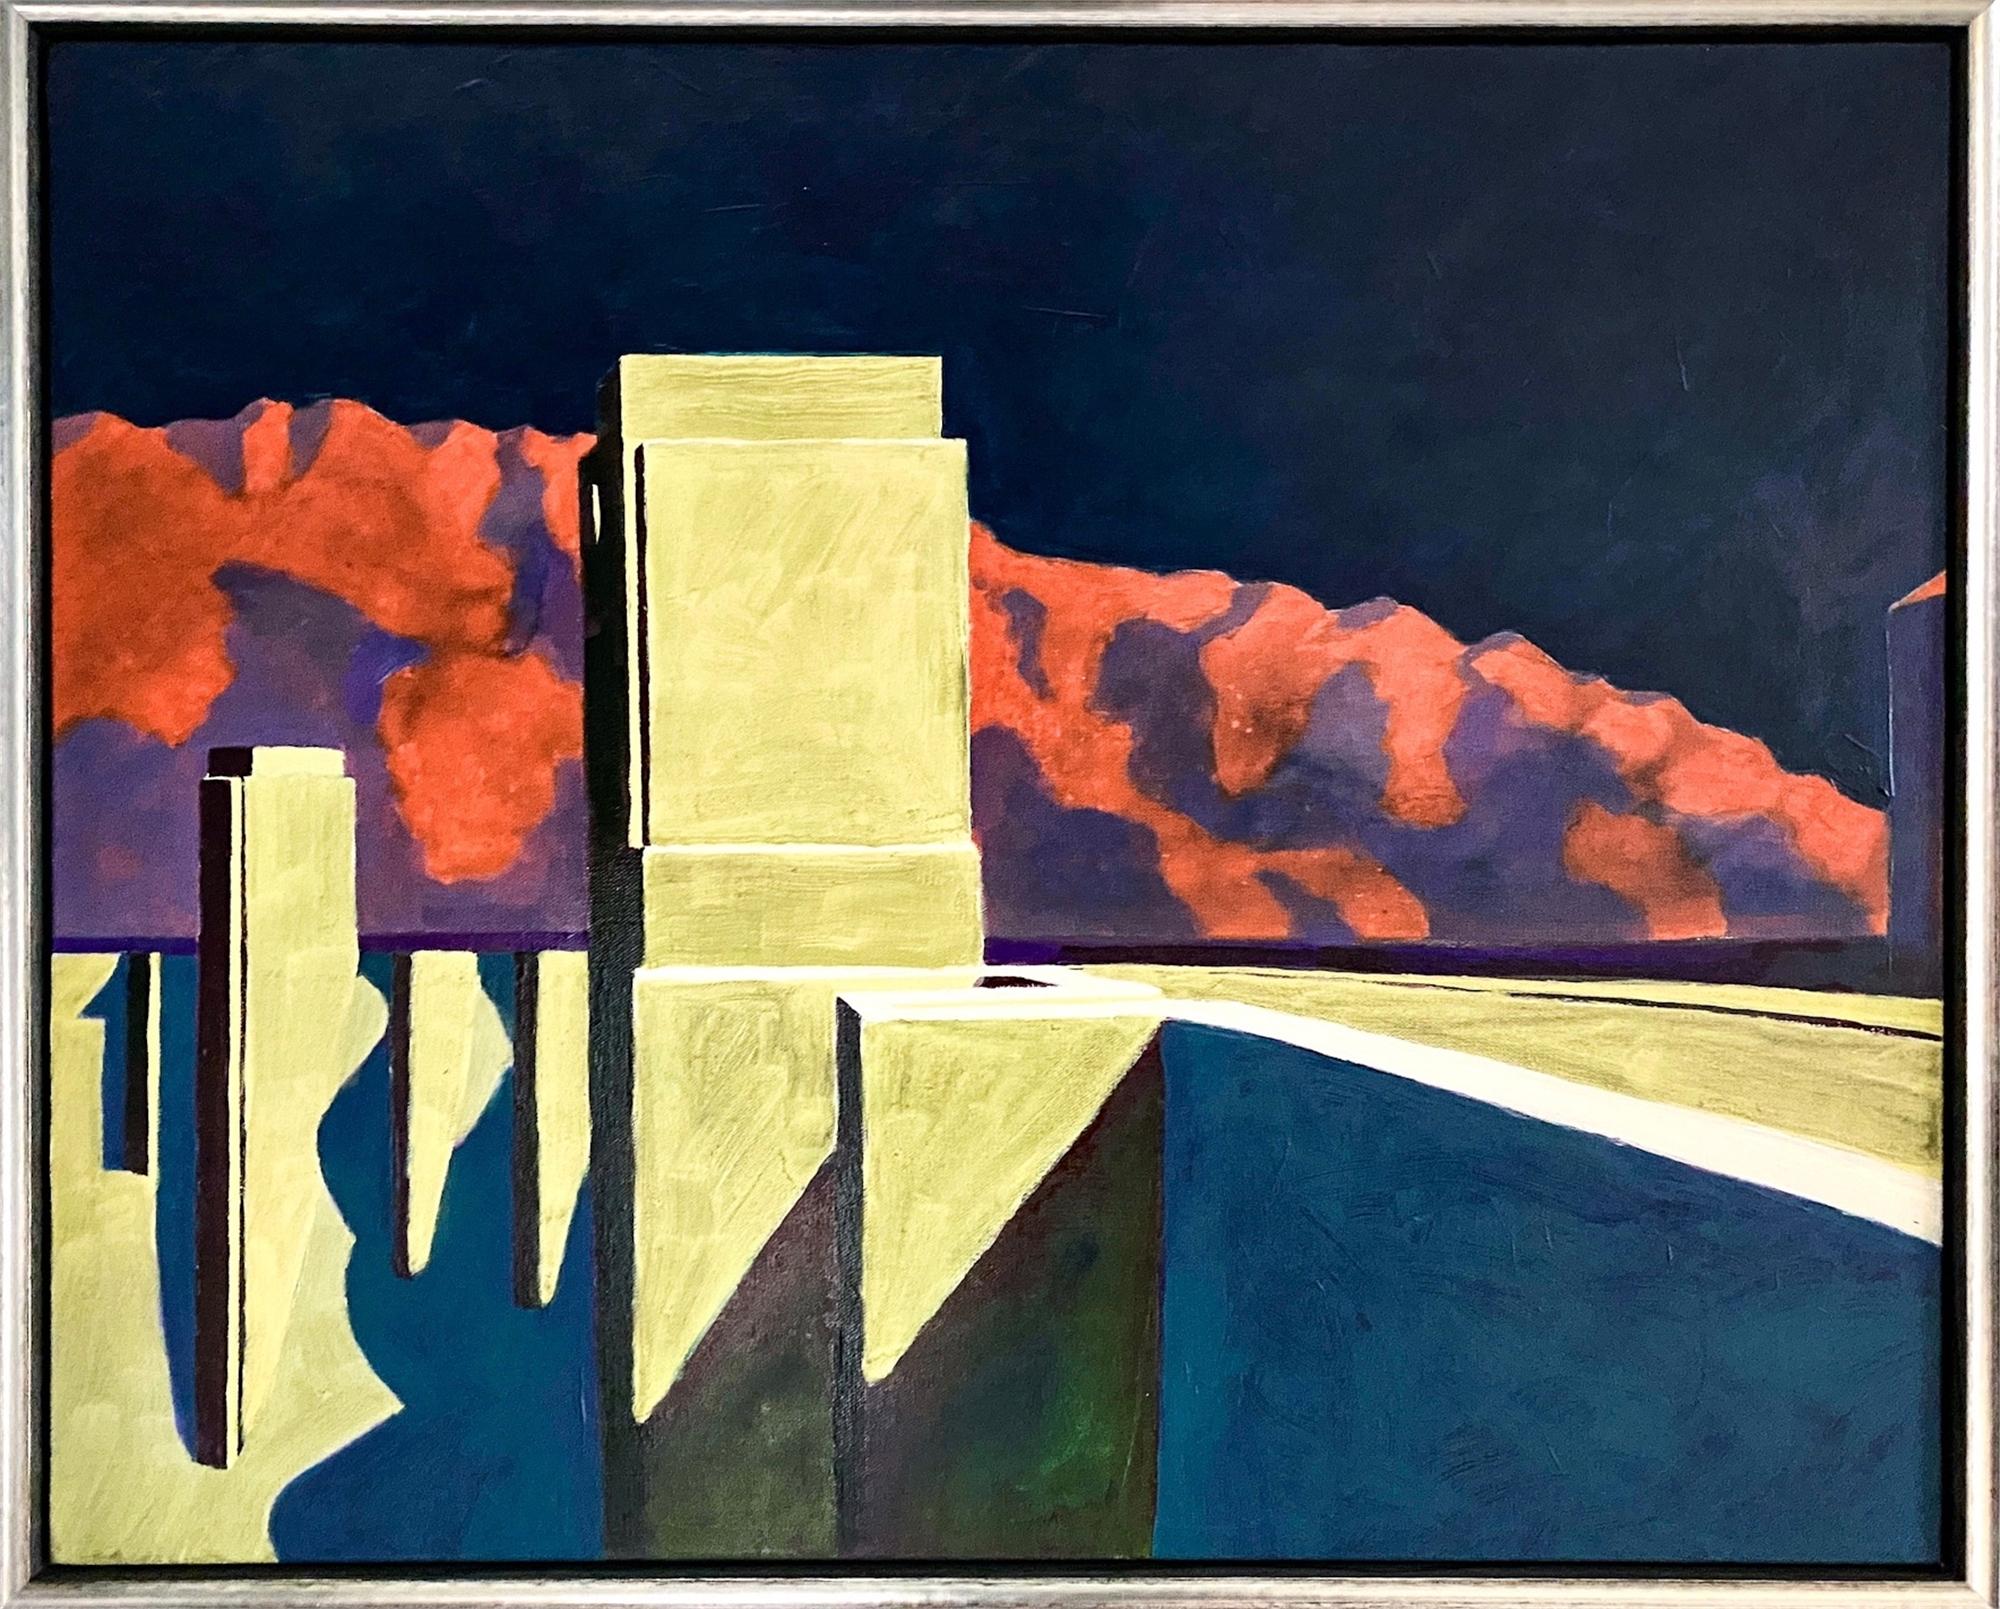 Hoover Nocturne by Christopher Turner